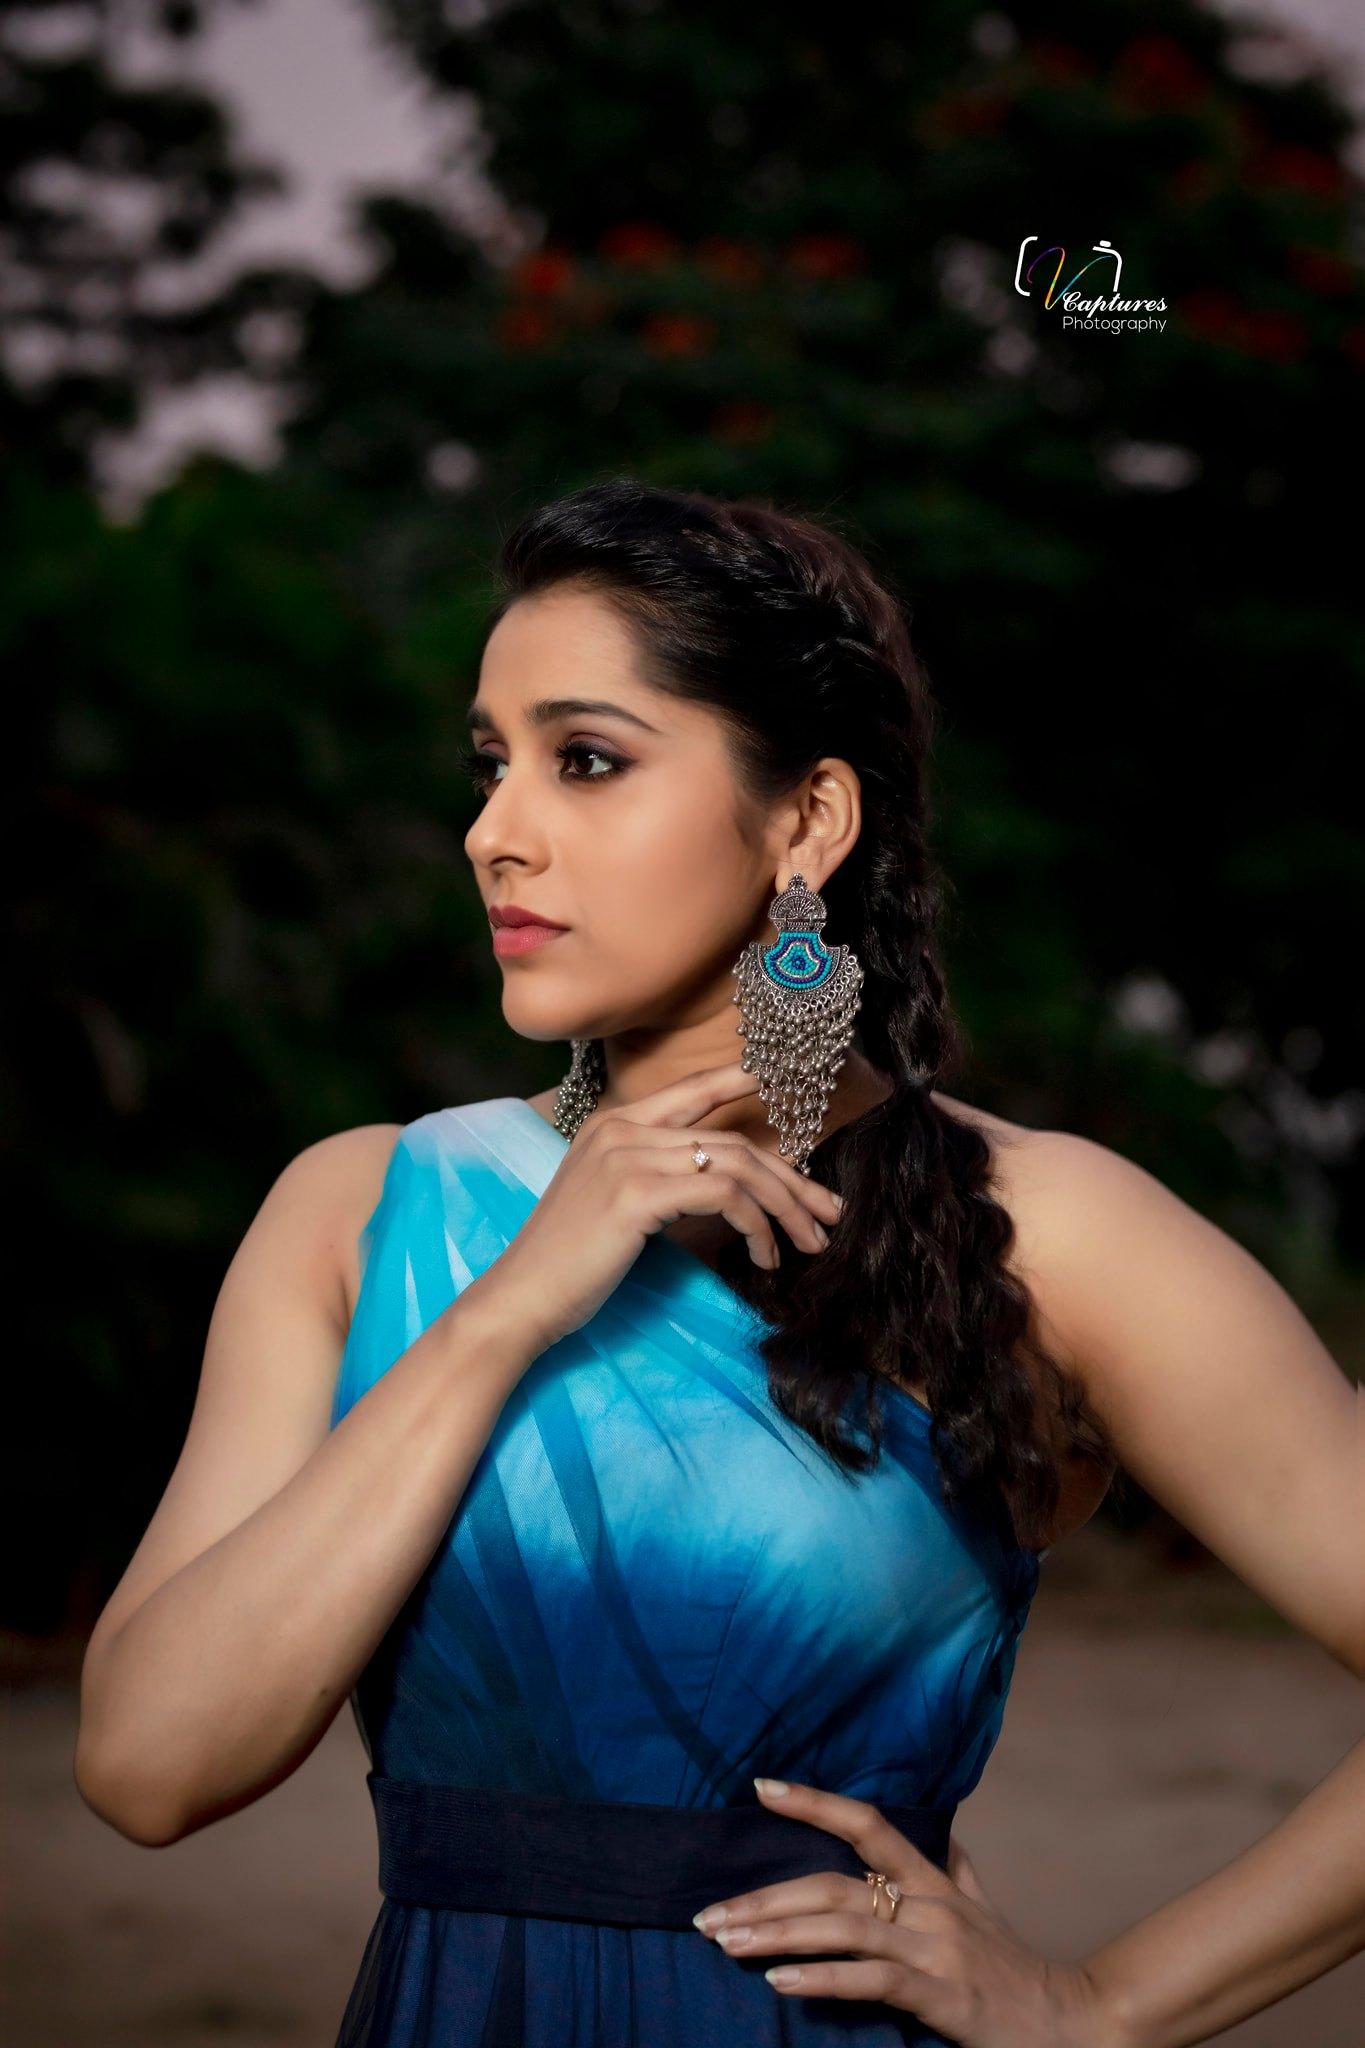 Gorgeous actress Rashmi gautham in one shoulder dress for jabardasth. |  |  |  | 2020-12-04